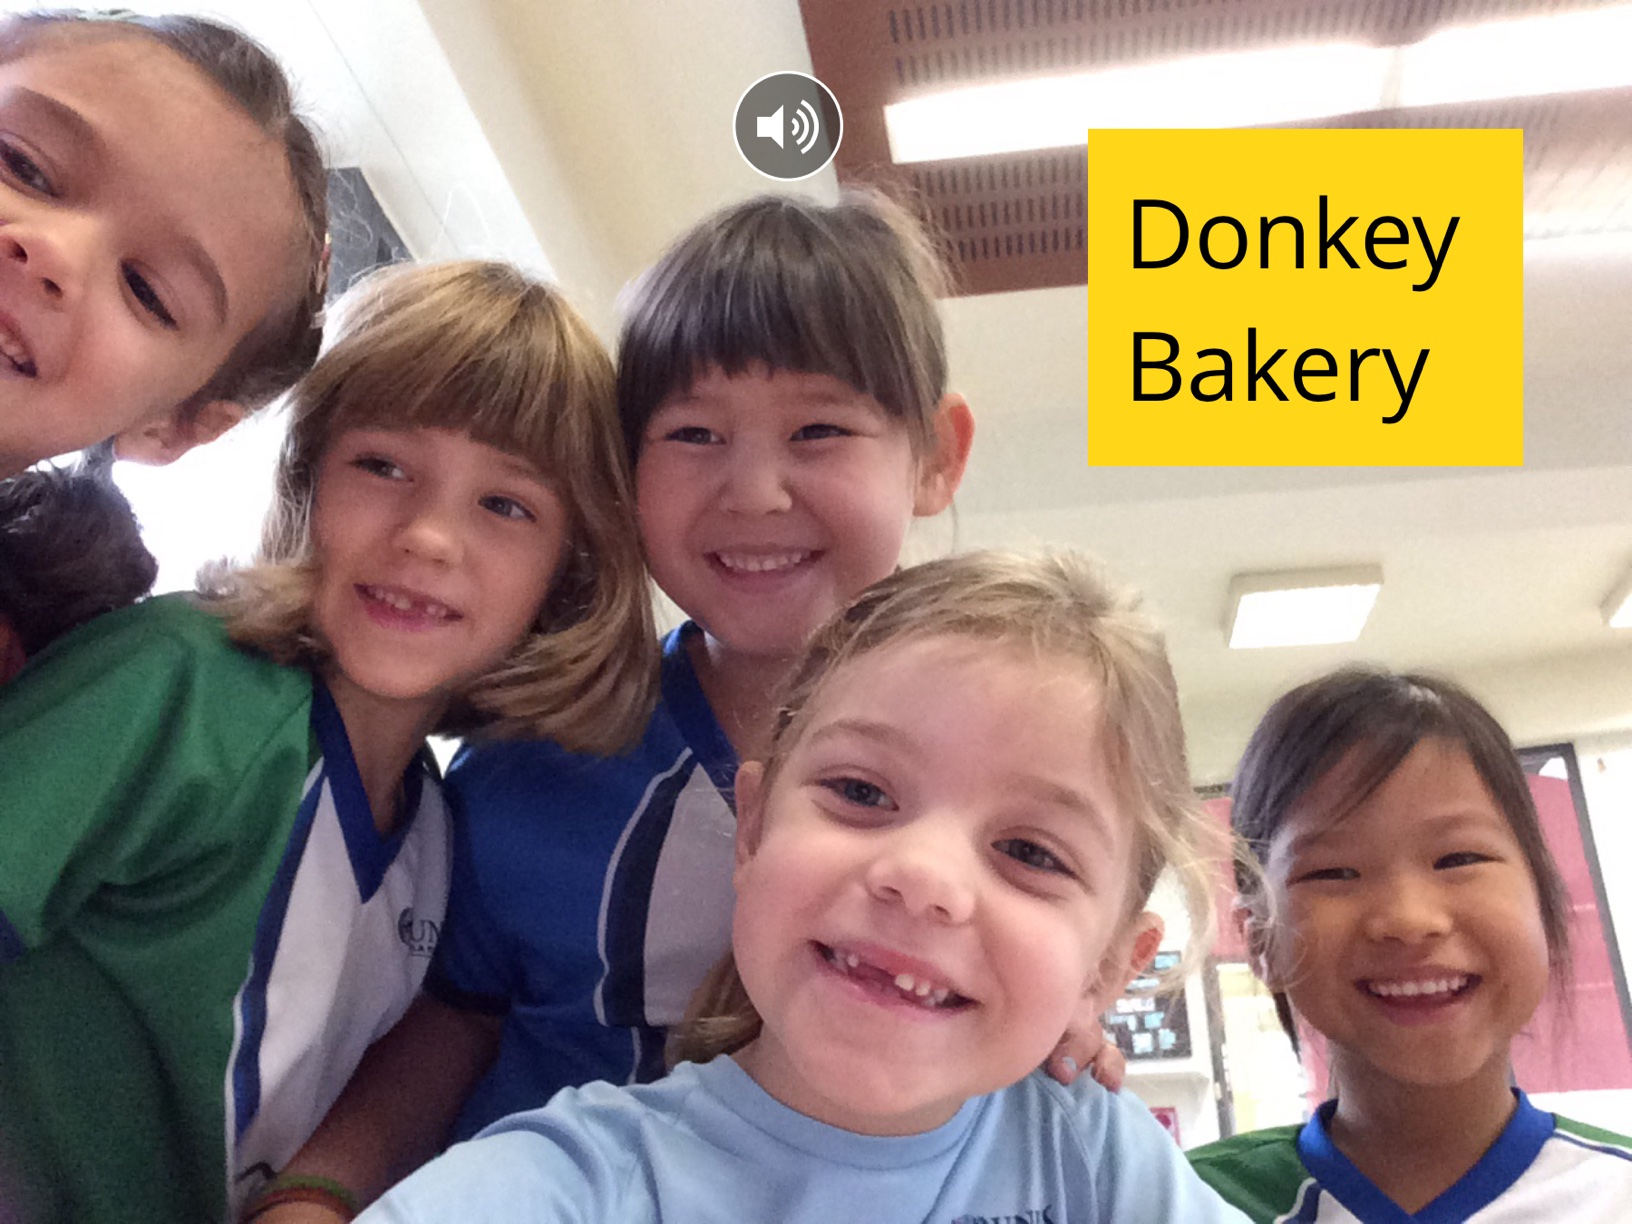 Donkey Bakery